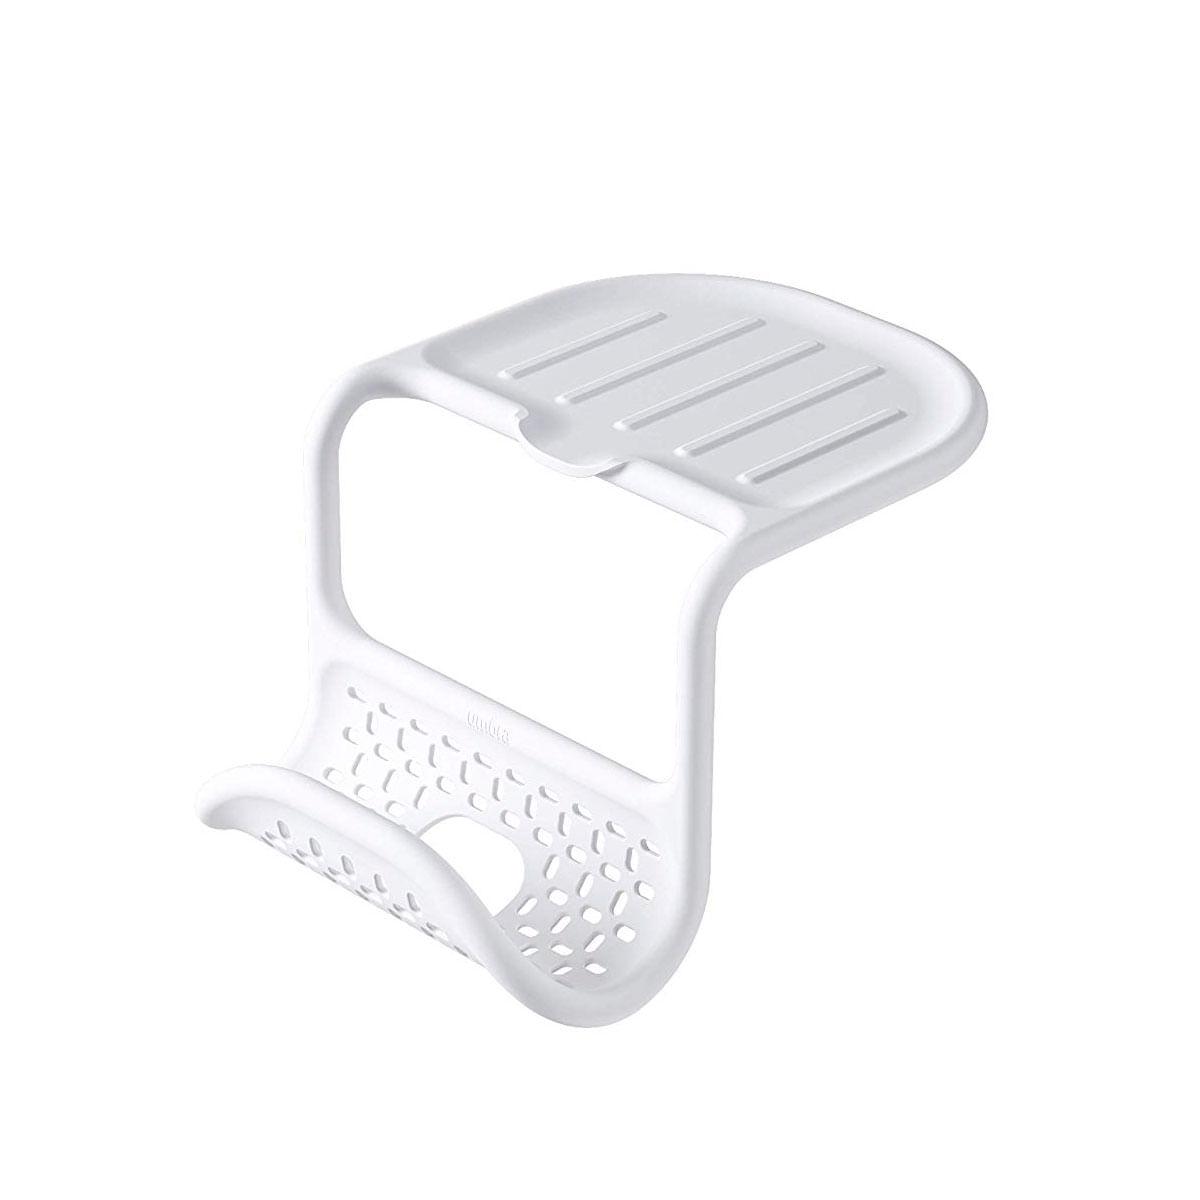 Suporte de Silicone Saddle Sink Caddy Branco Umbra